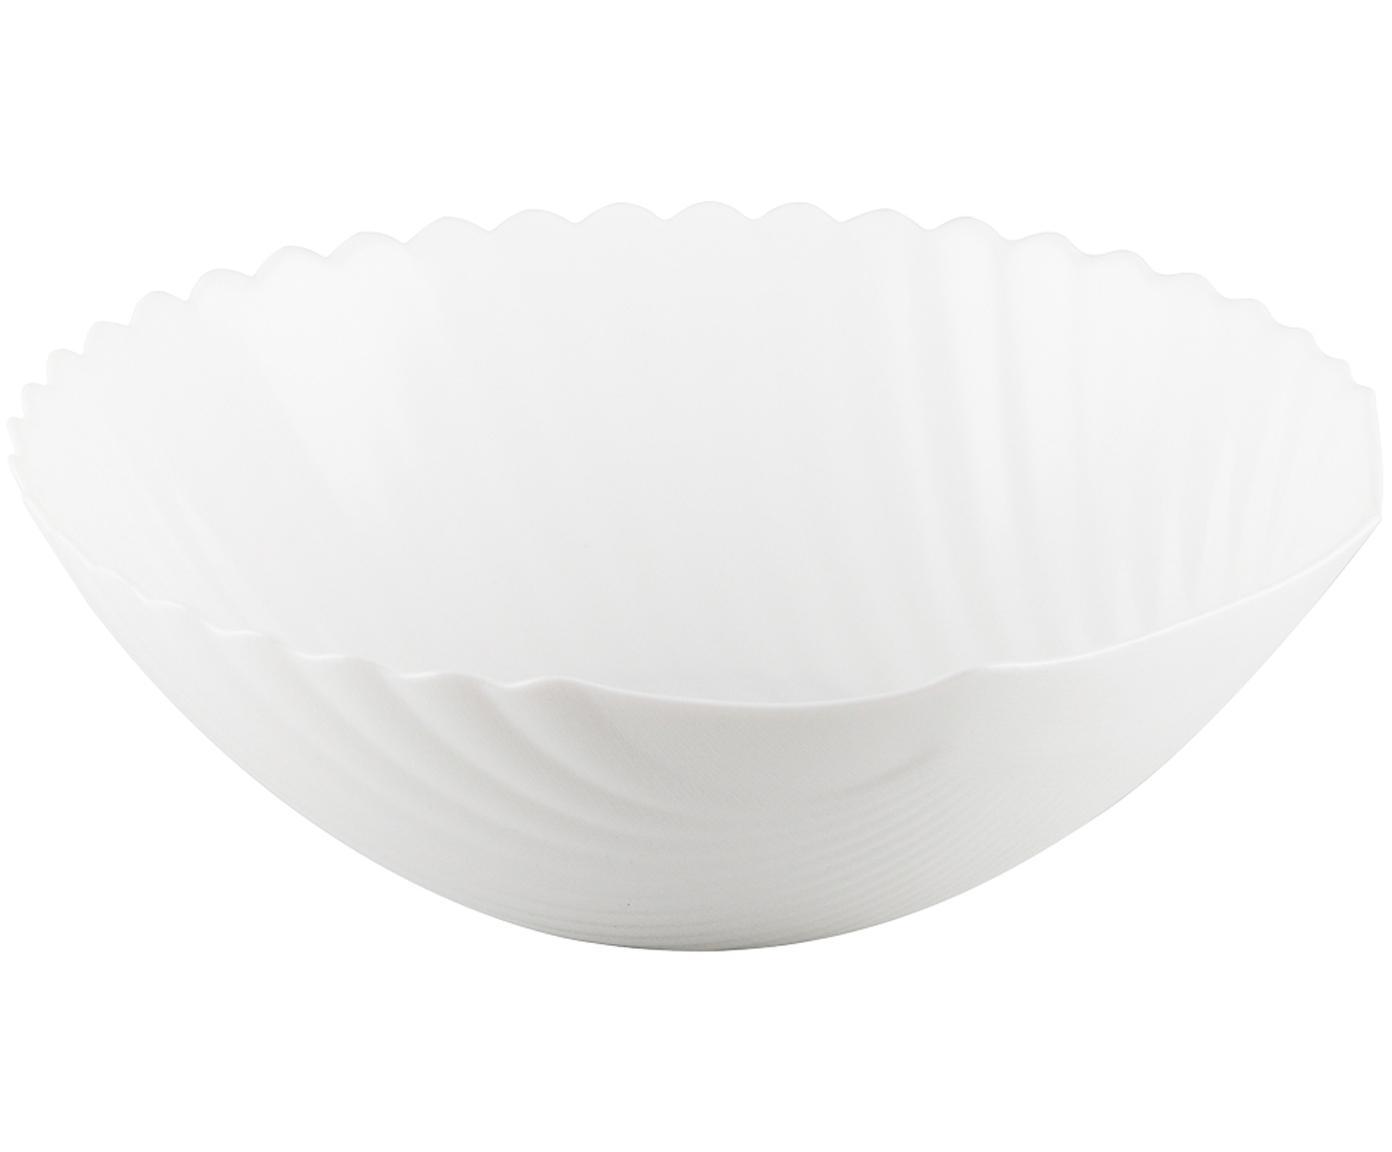 Centrotavola a forma di cozza Shell, Vetro, Bianco, Ø 24 x Alt. 8 cm